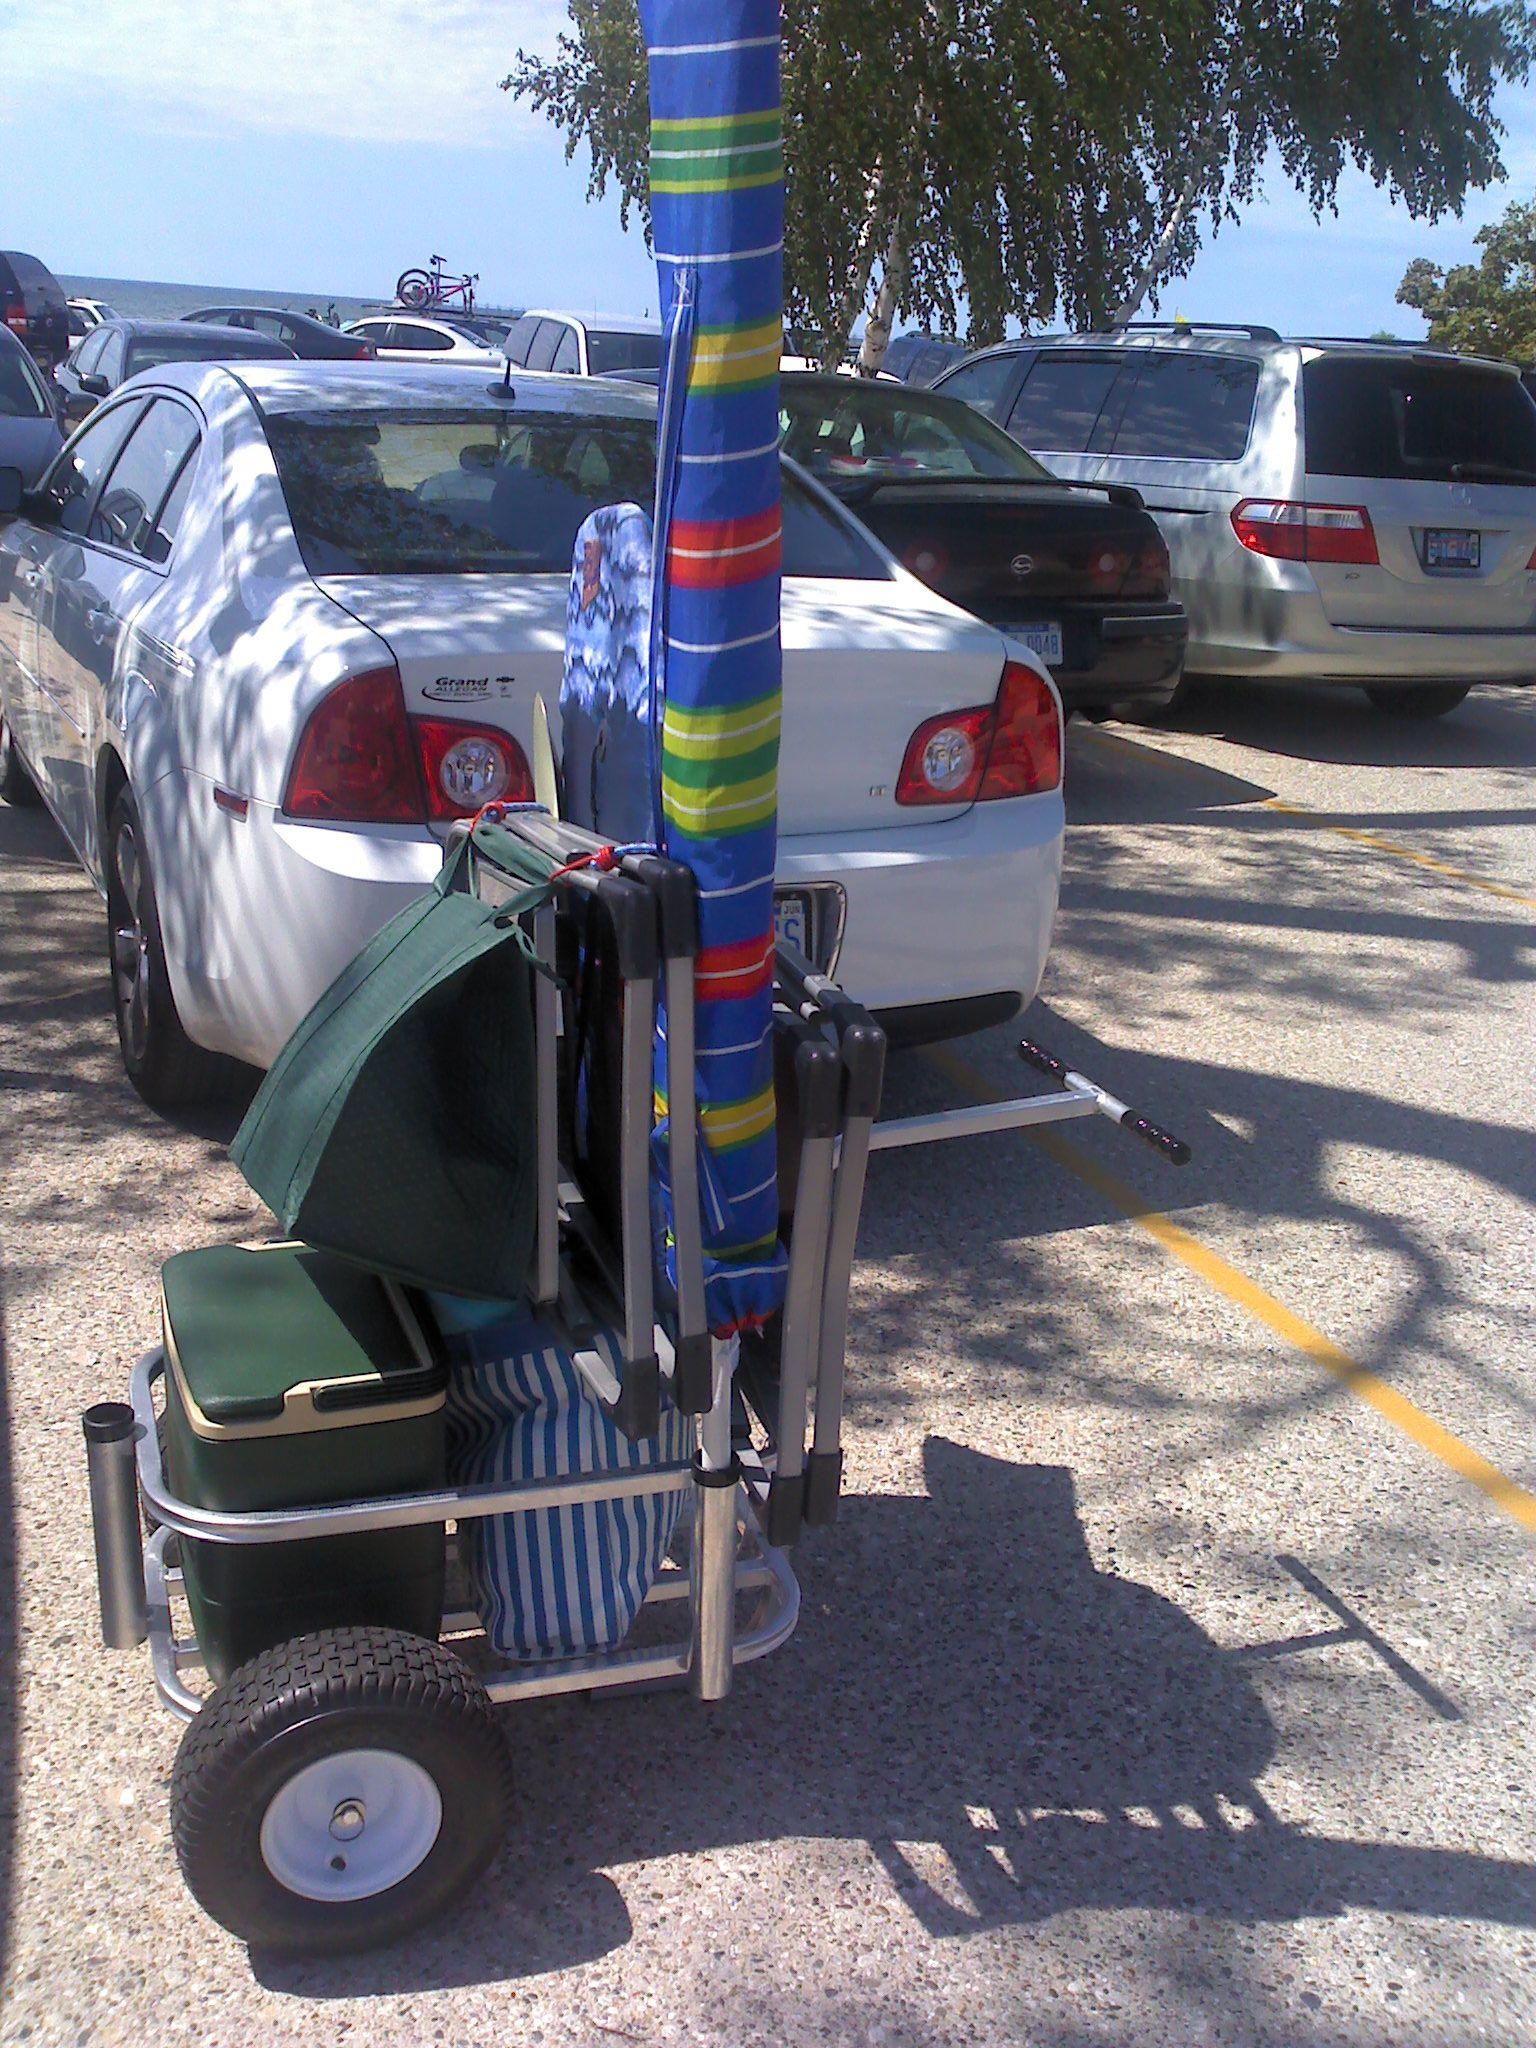 df52f5ec5d5e beach cart fully loaded. Cooler,snack bag, beach bag,umbrella,chairs ...